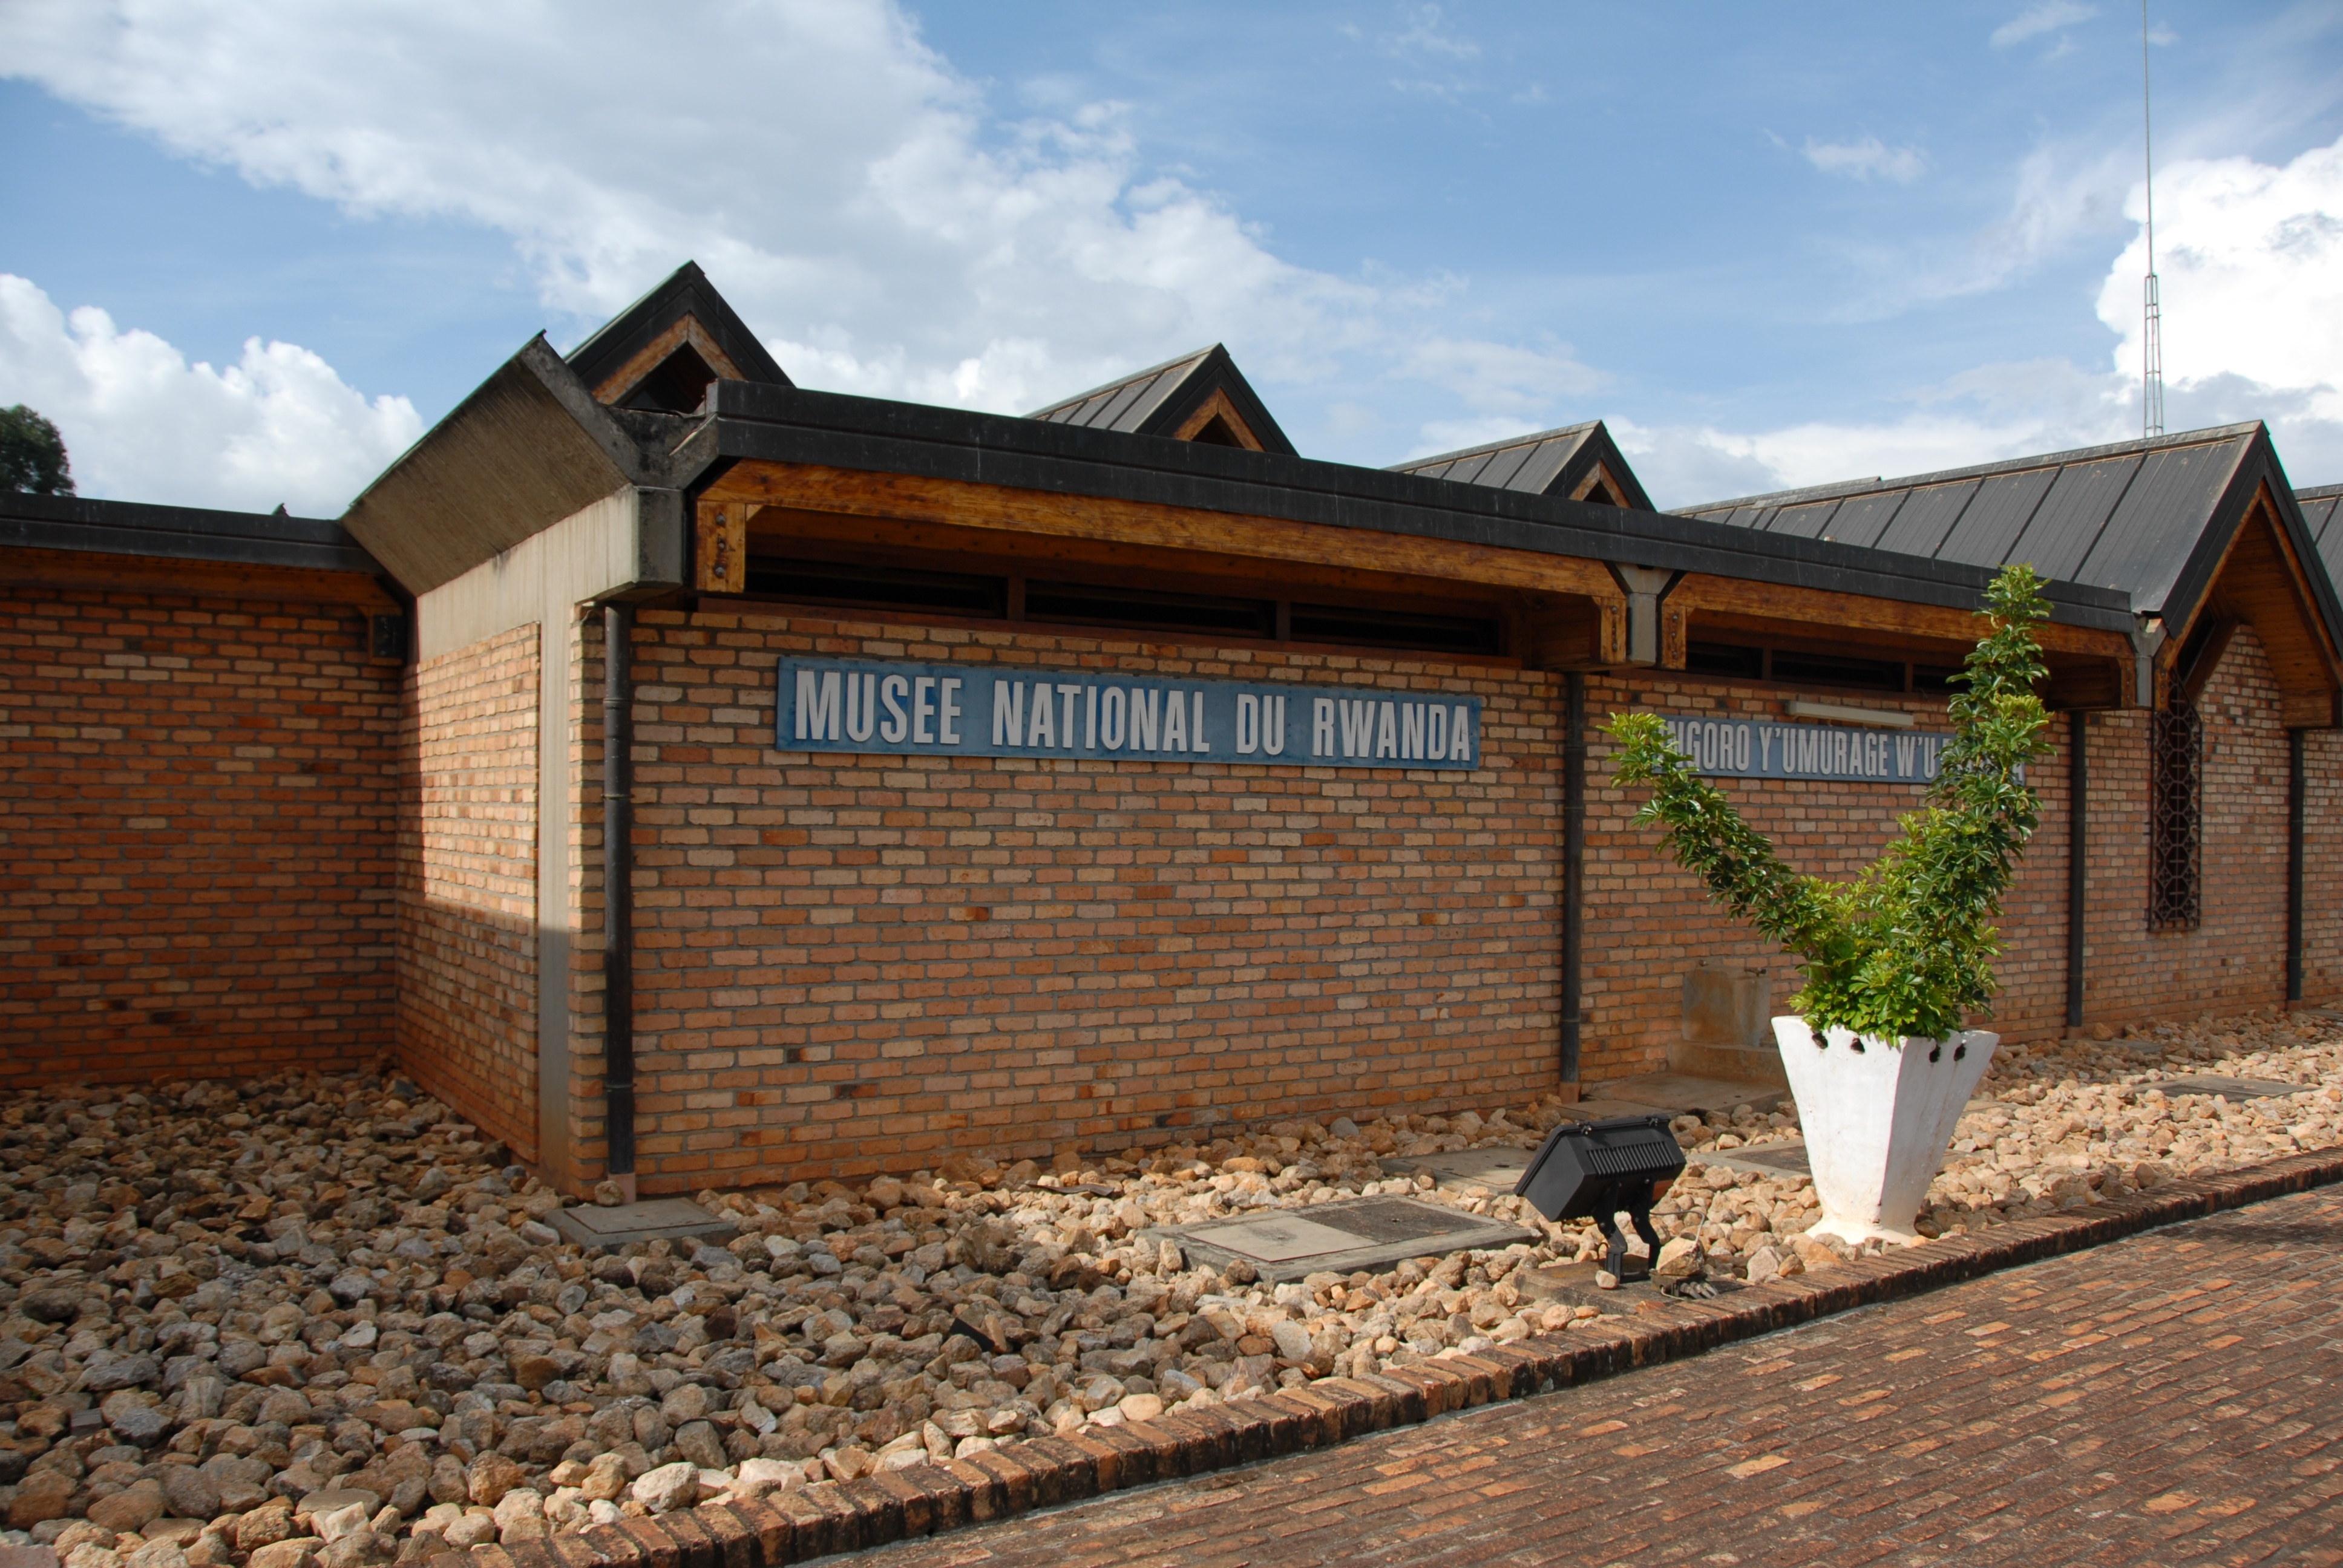 National_Museum_of_Rwanda